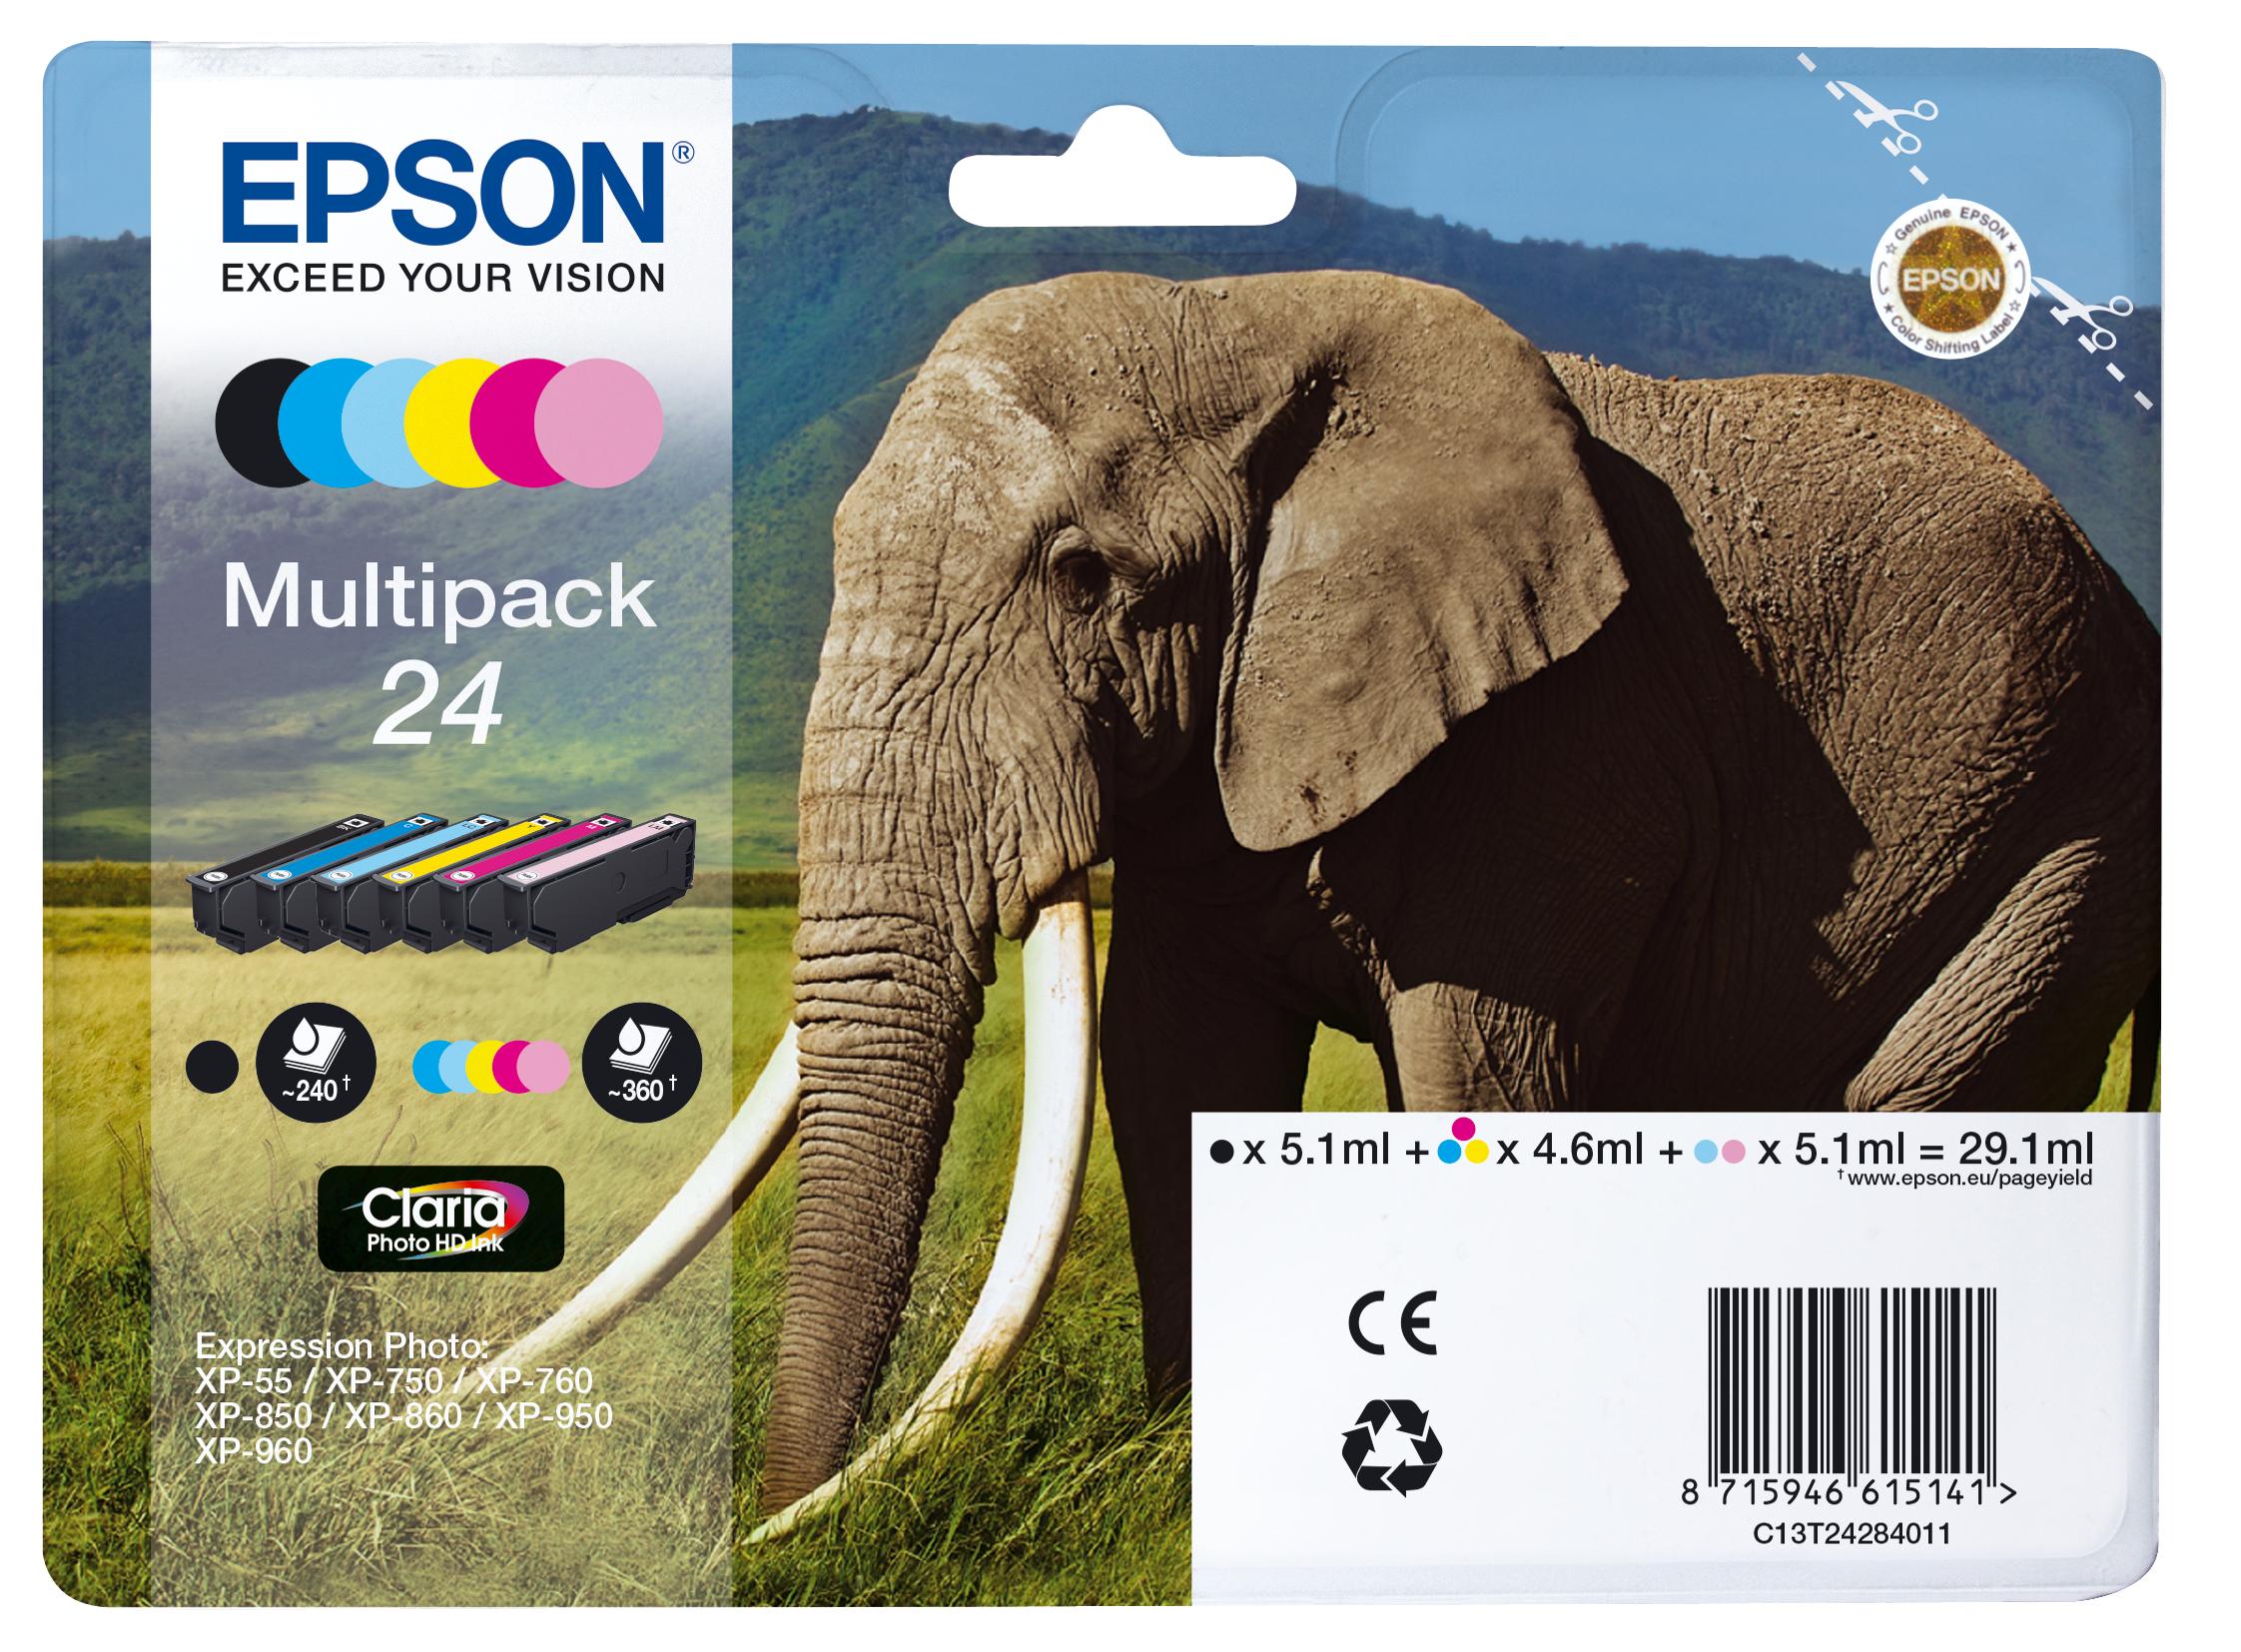 Multipack negro / cian / magenta / amarillo / Cian (claro) / Magenta (claro) C13T24284011 T2428 6 Cartuchos de tinta: T2421-T2426